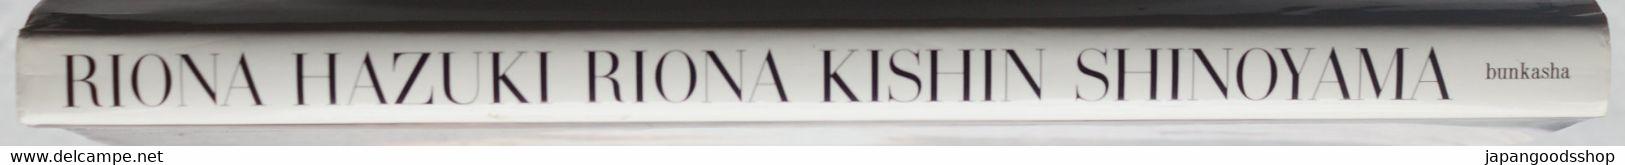 """ Riona "" Riona Hazuki, Photographs : Kishin Shinoyama - Books, Magazines, Comics"